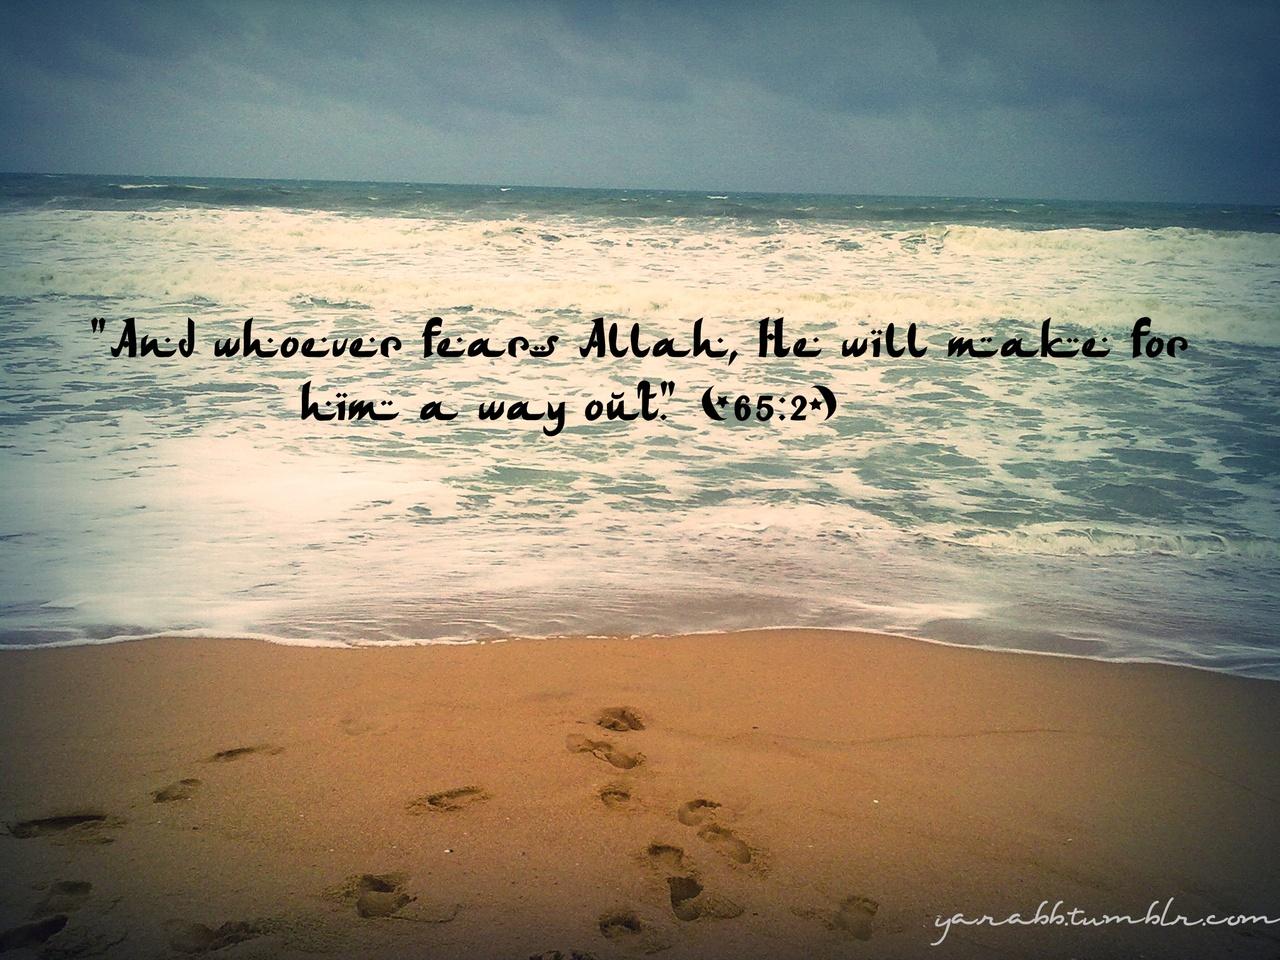 Islamic Quotes Hd Wallpaper - Beach Ridge - HD Wallpaper